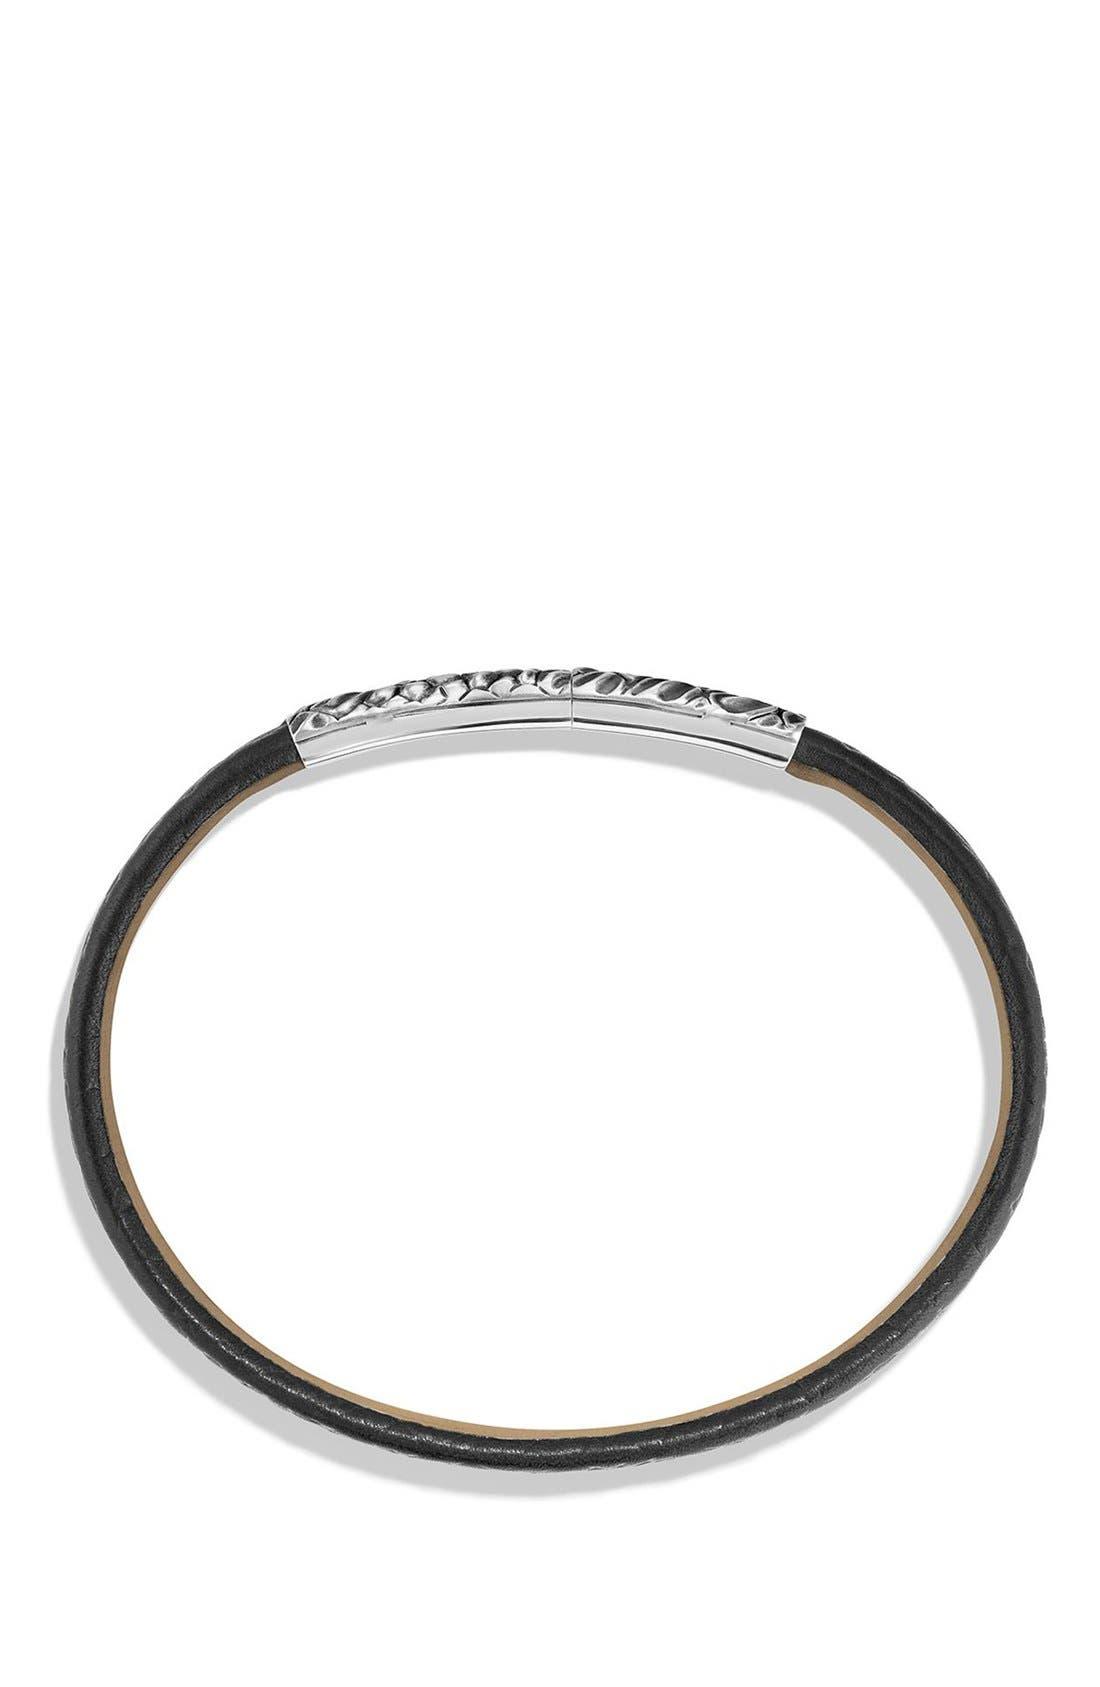 Gator Leather Bracelet,                             Alternate thumbnail 2, color,                             001